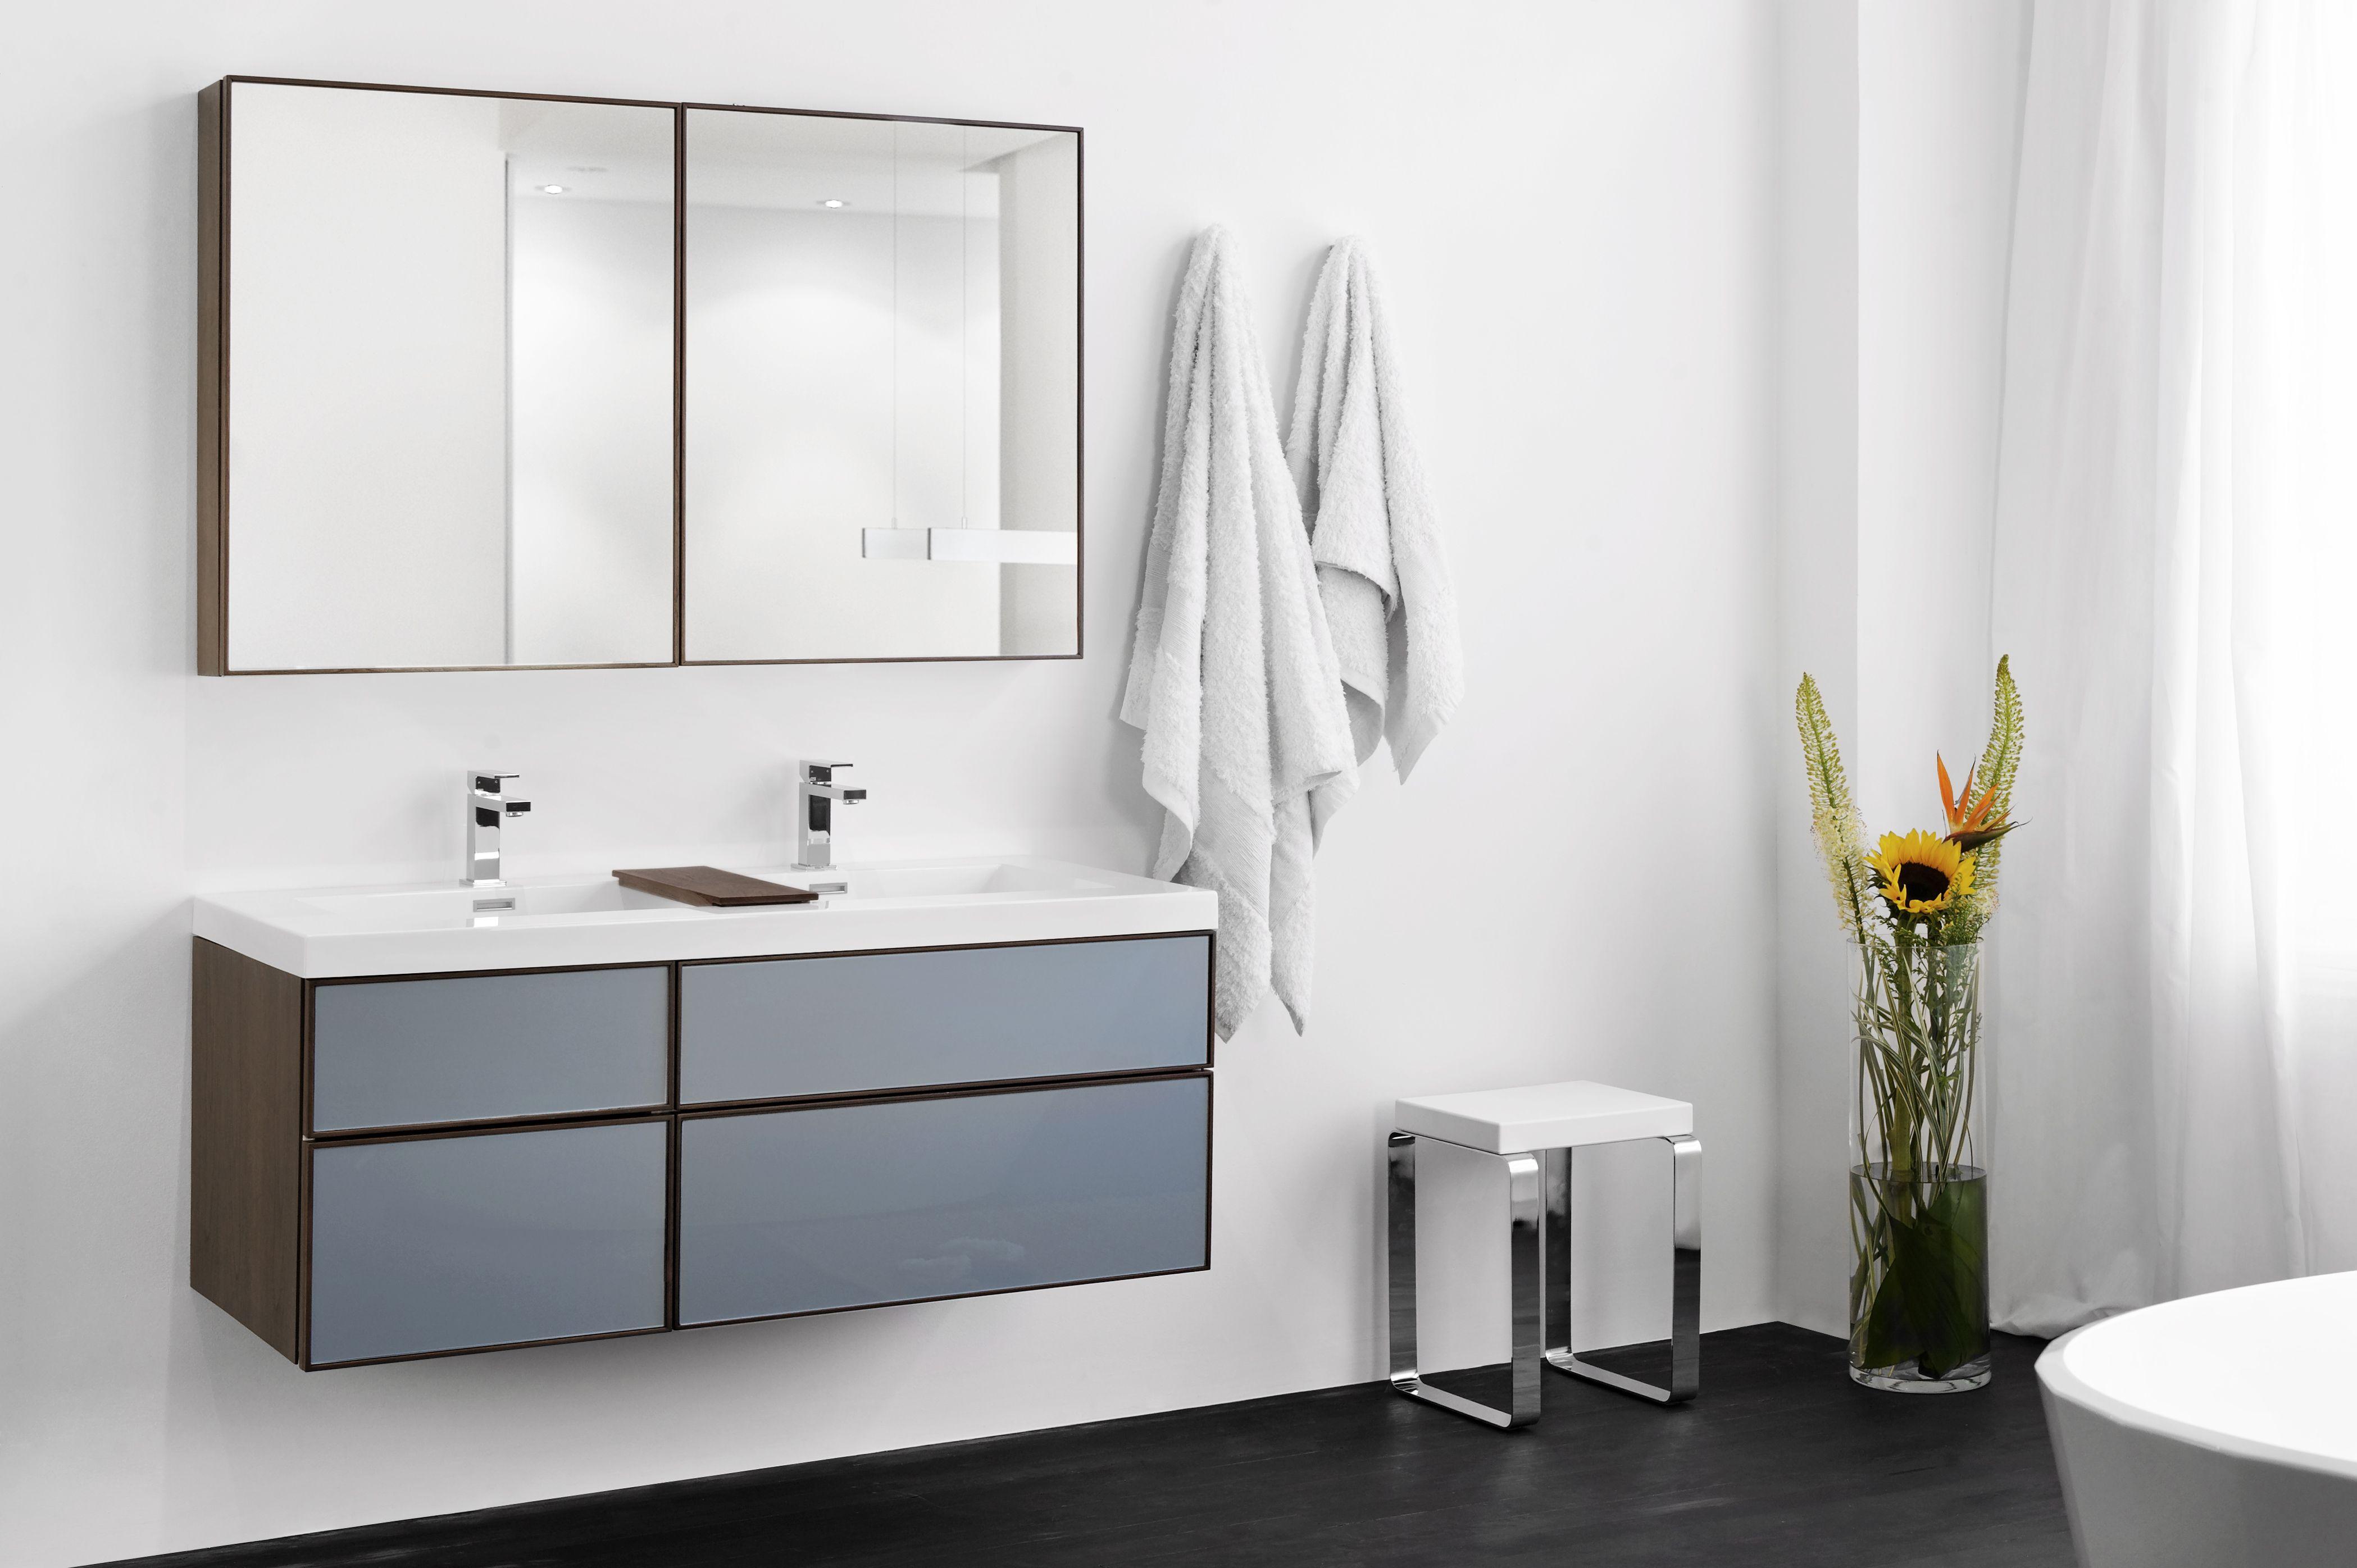 Home Frame Collection Modern Bathroom Vanity Contemporary Bathtubs